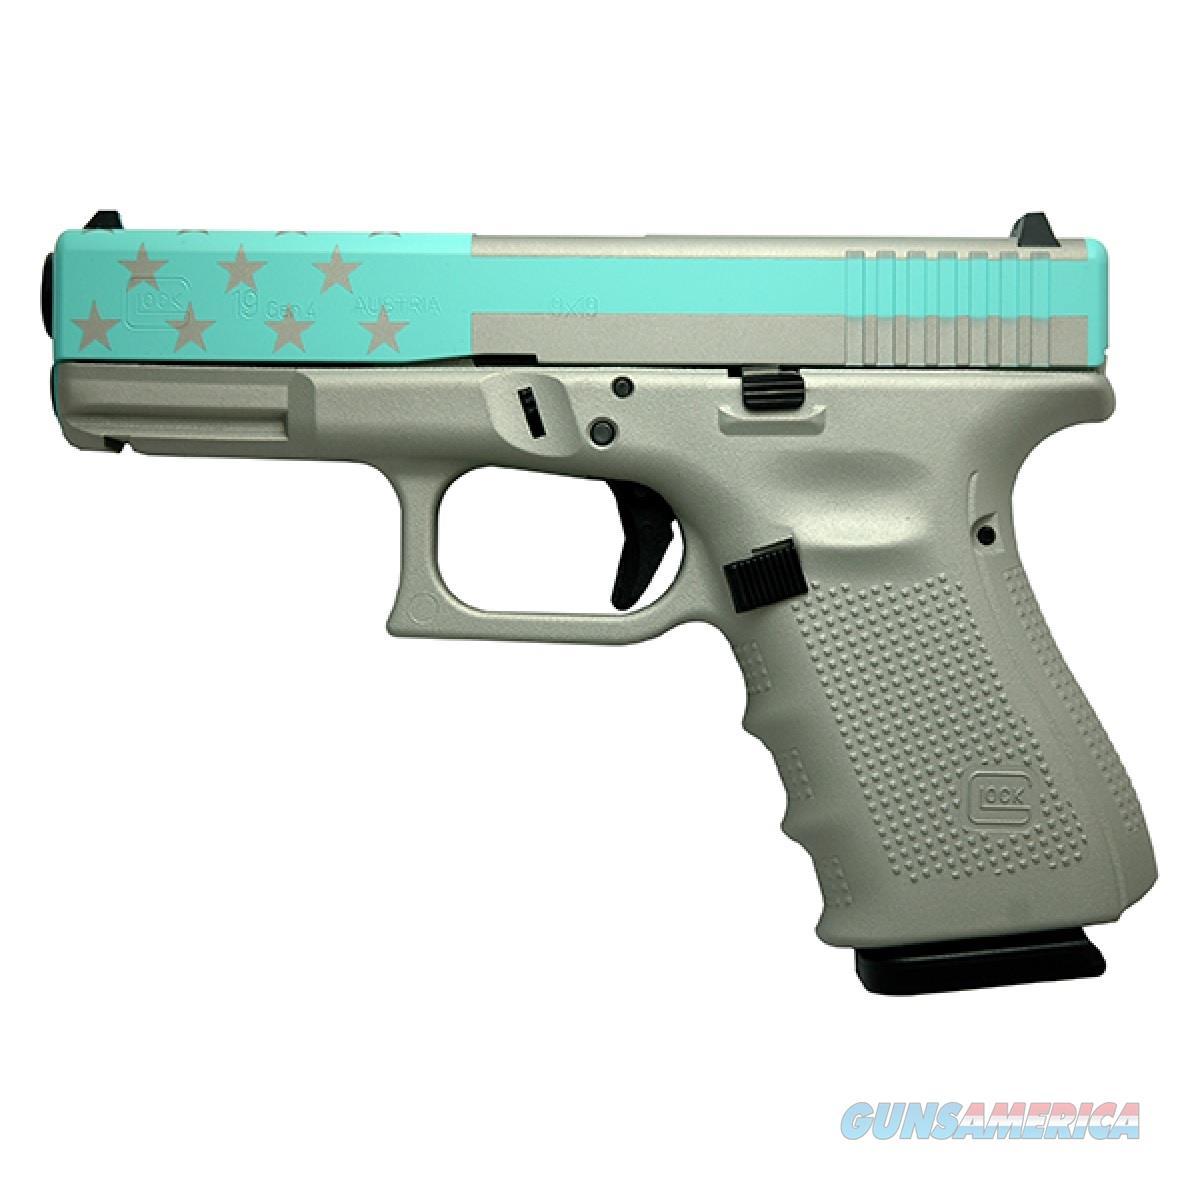 "Glock G19 Gen 4 9mm Silver/Blue Flag 4.02"" W260-99560   Guns > Pistols > Glock Pistols > 19/19X"